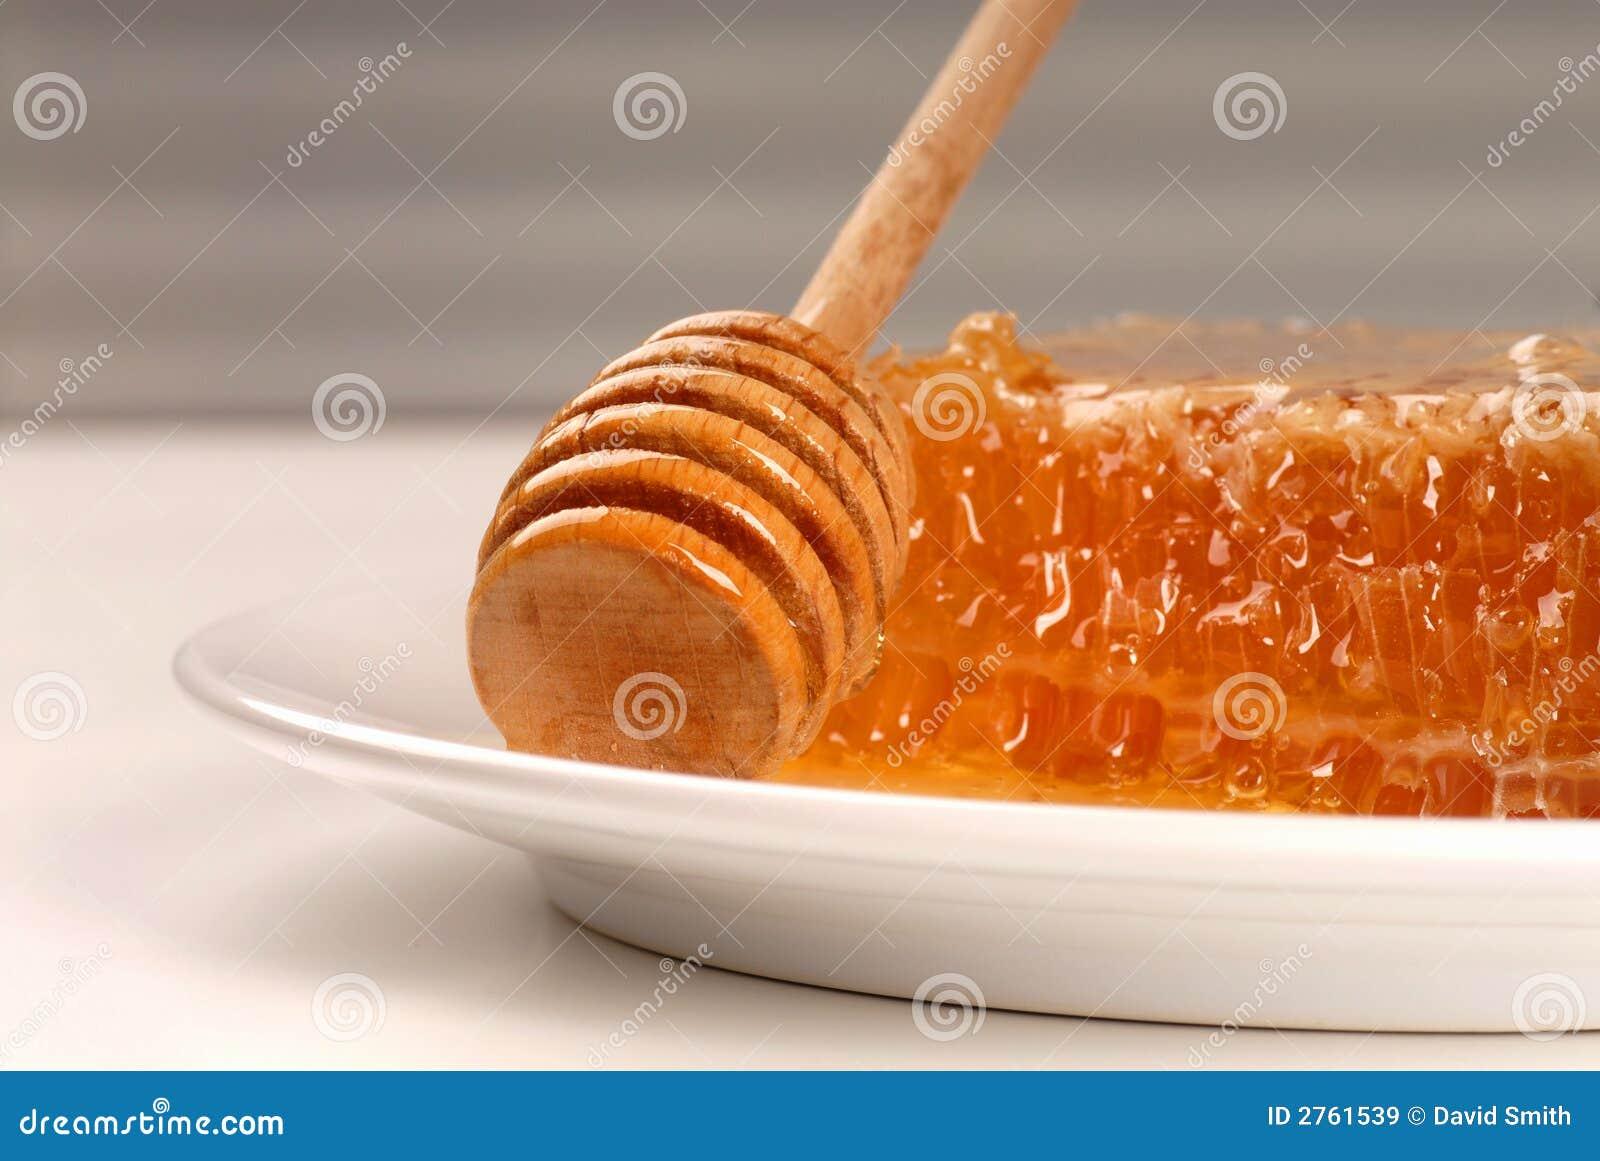 Bienenwabe Mit Honig Stab